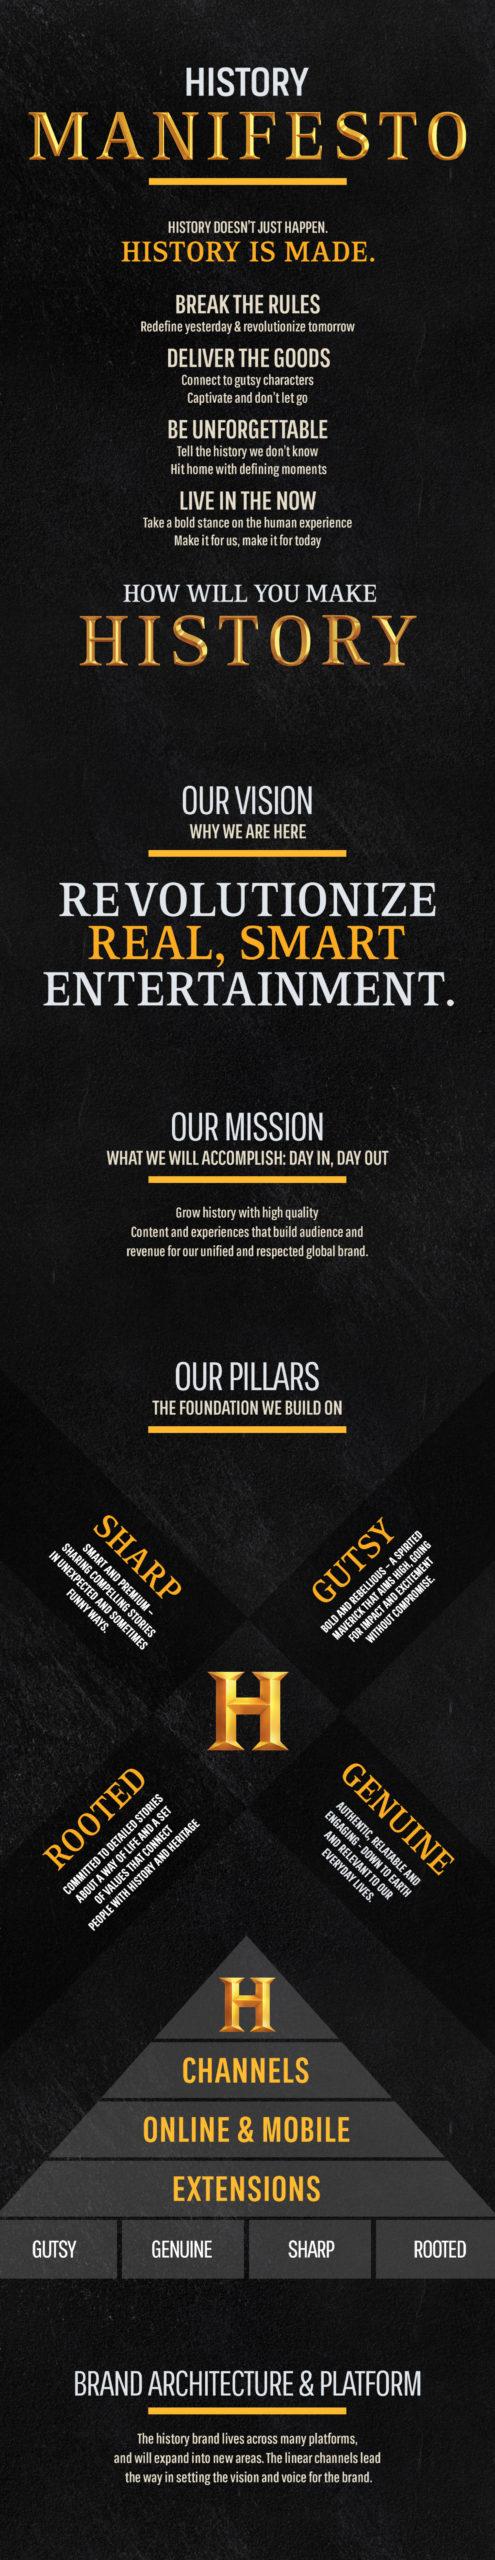 History Brand Manifesto Poster